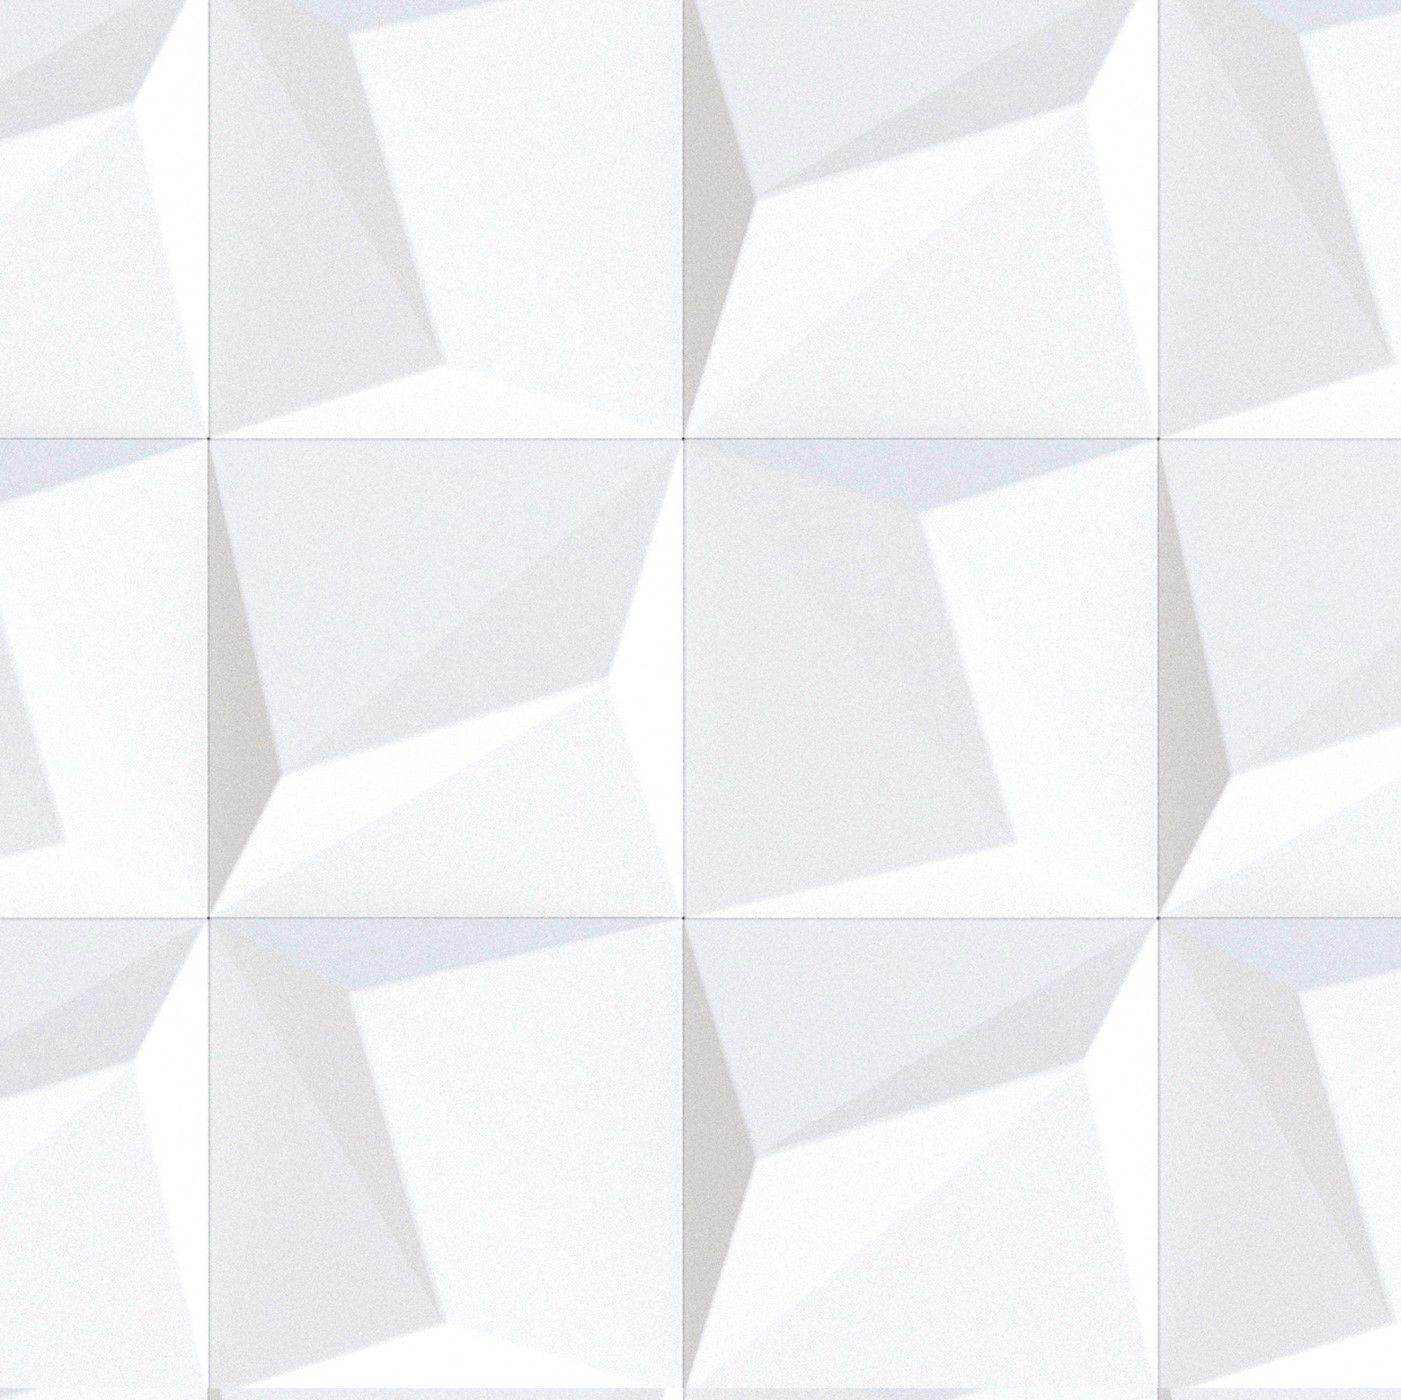 Papel de Parede Efeito 3D Lavável CO-713 - Cole Aí